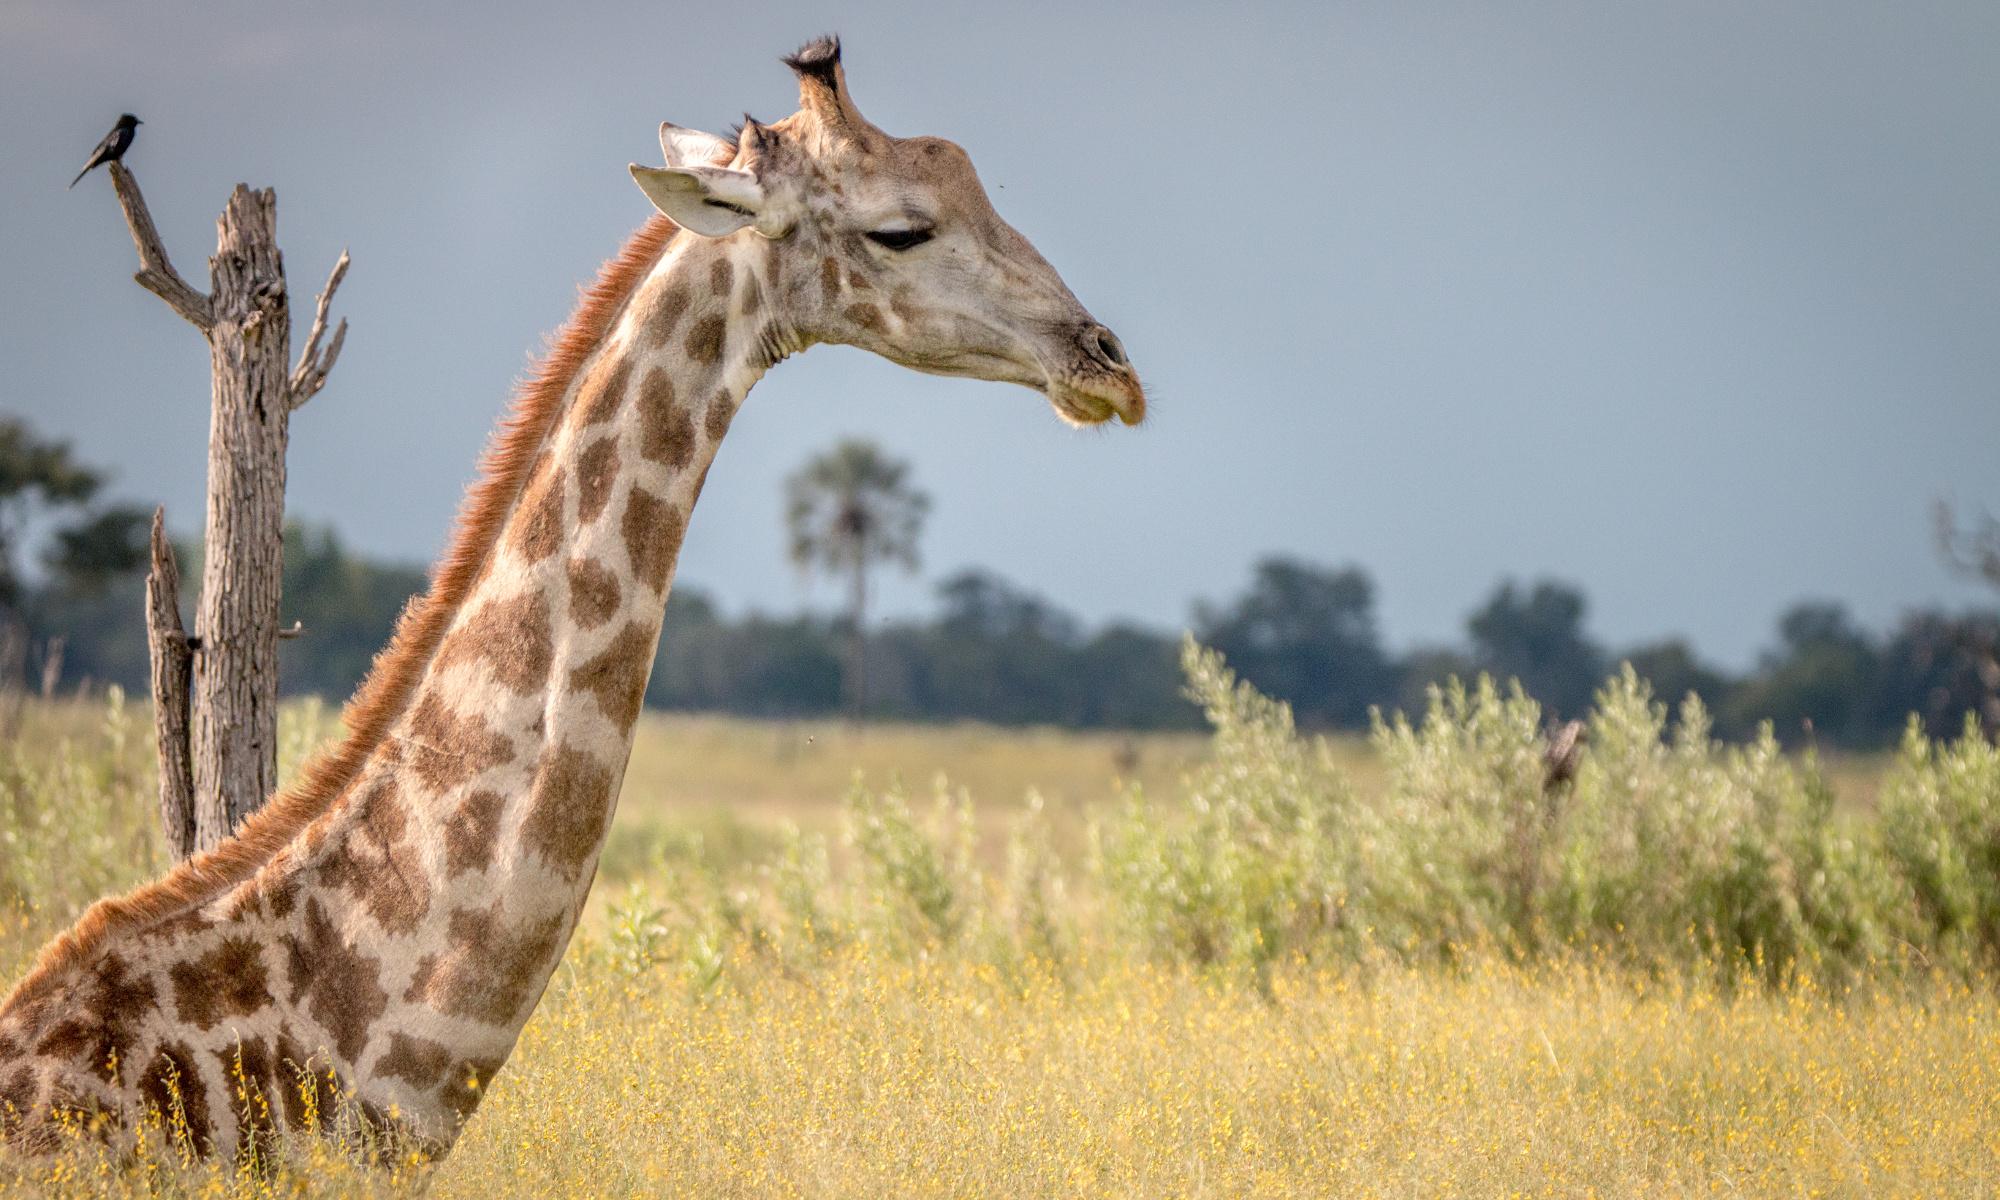 A Giraffe sitting in the grass in the Okavango Delta, Botswana.